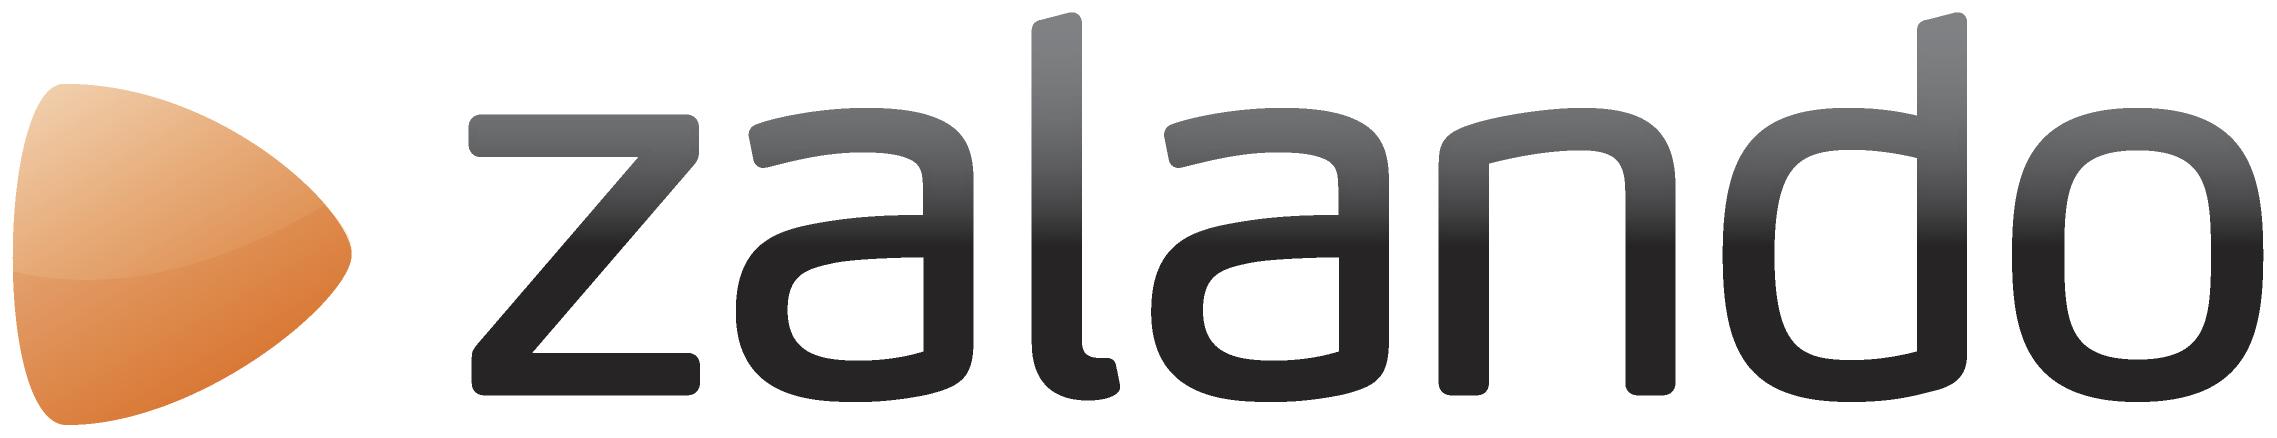 zalando_logo_53.png